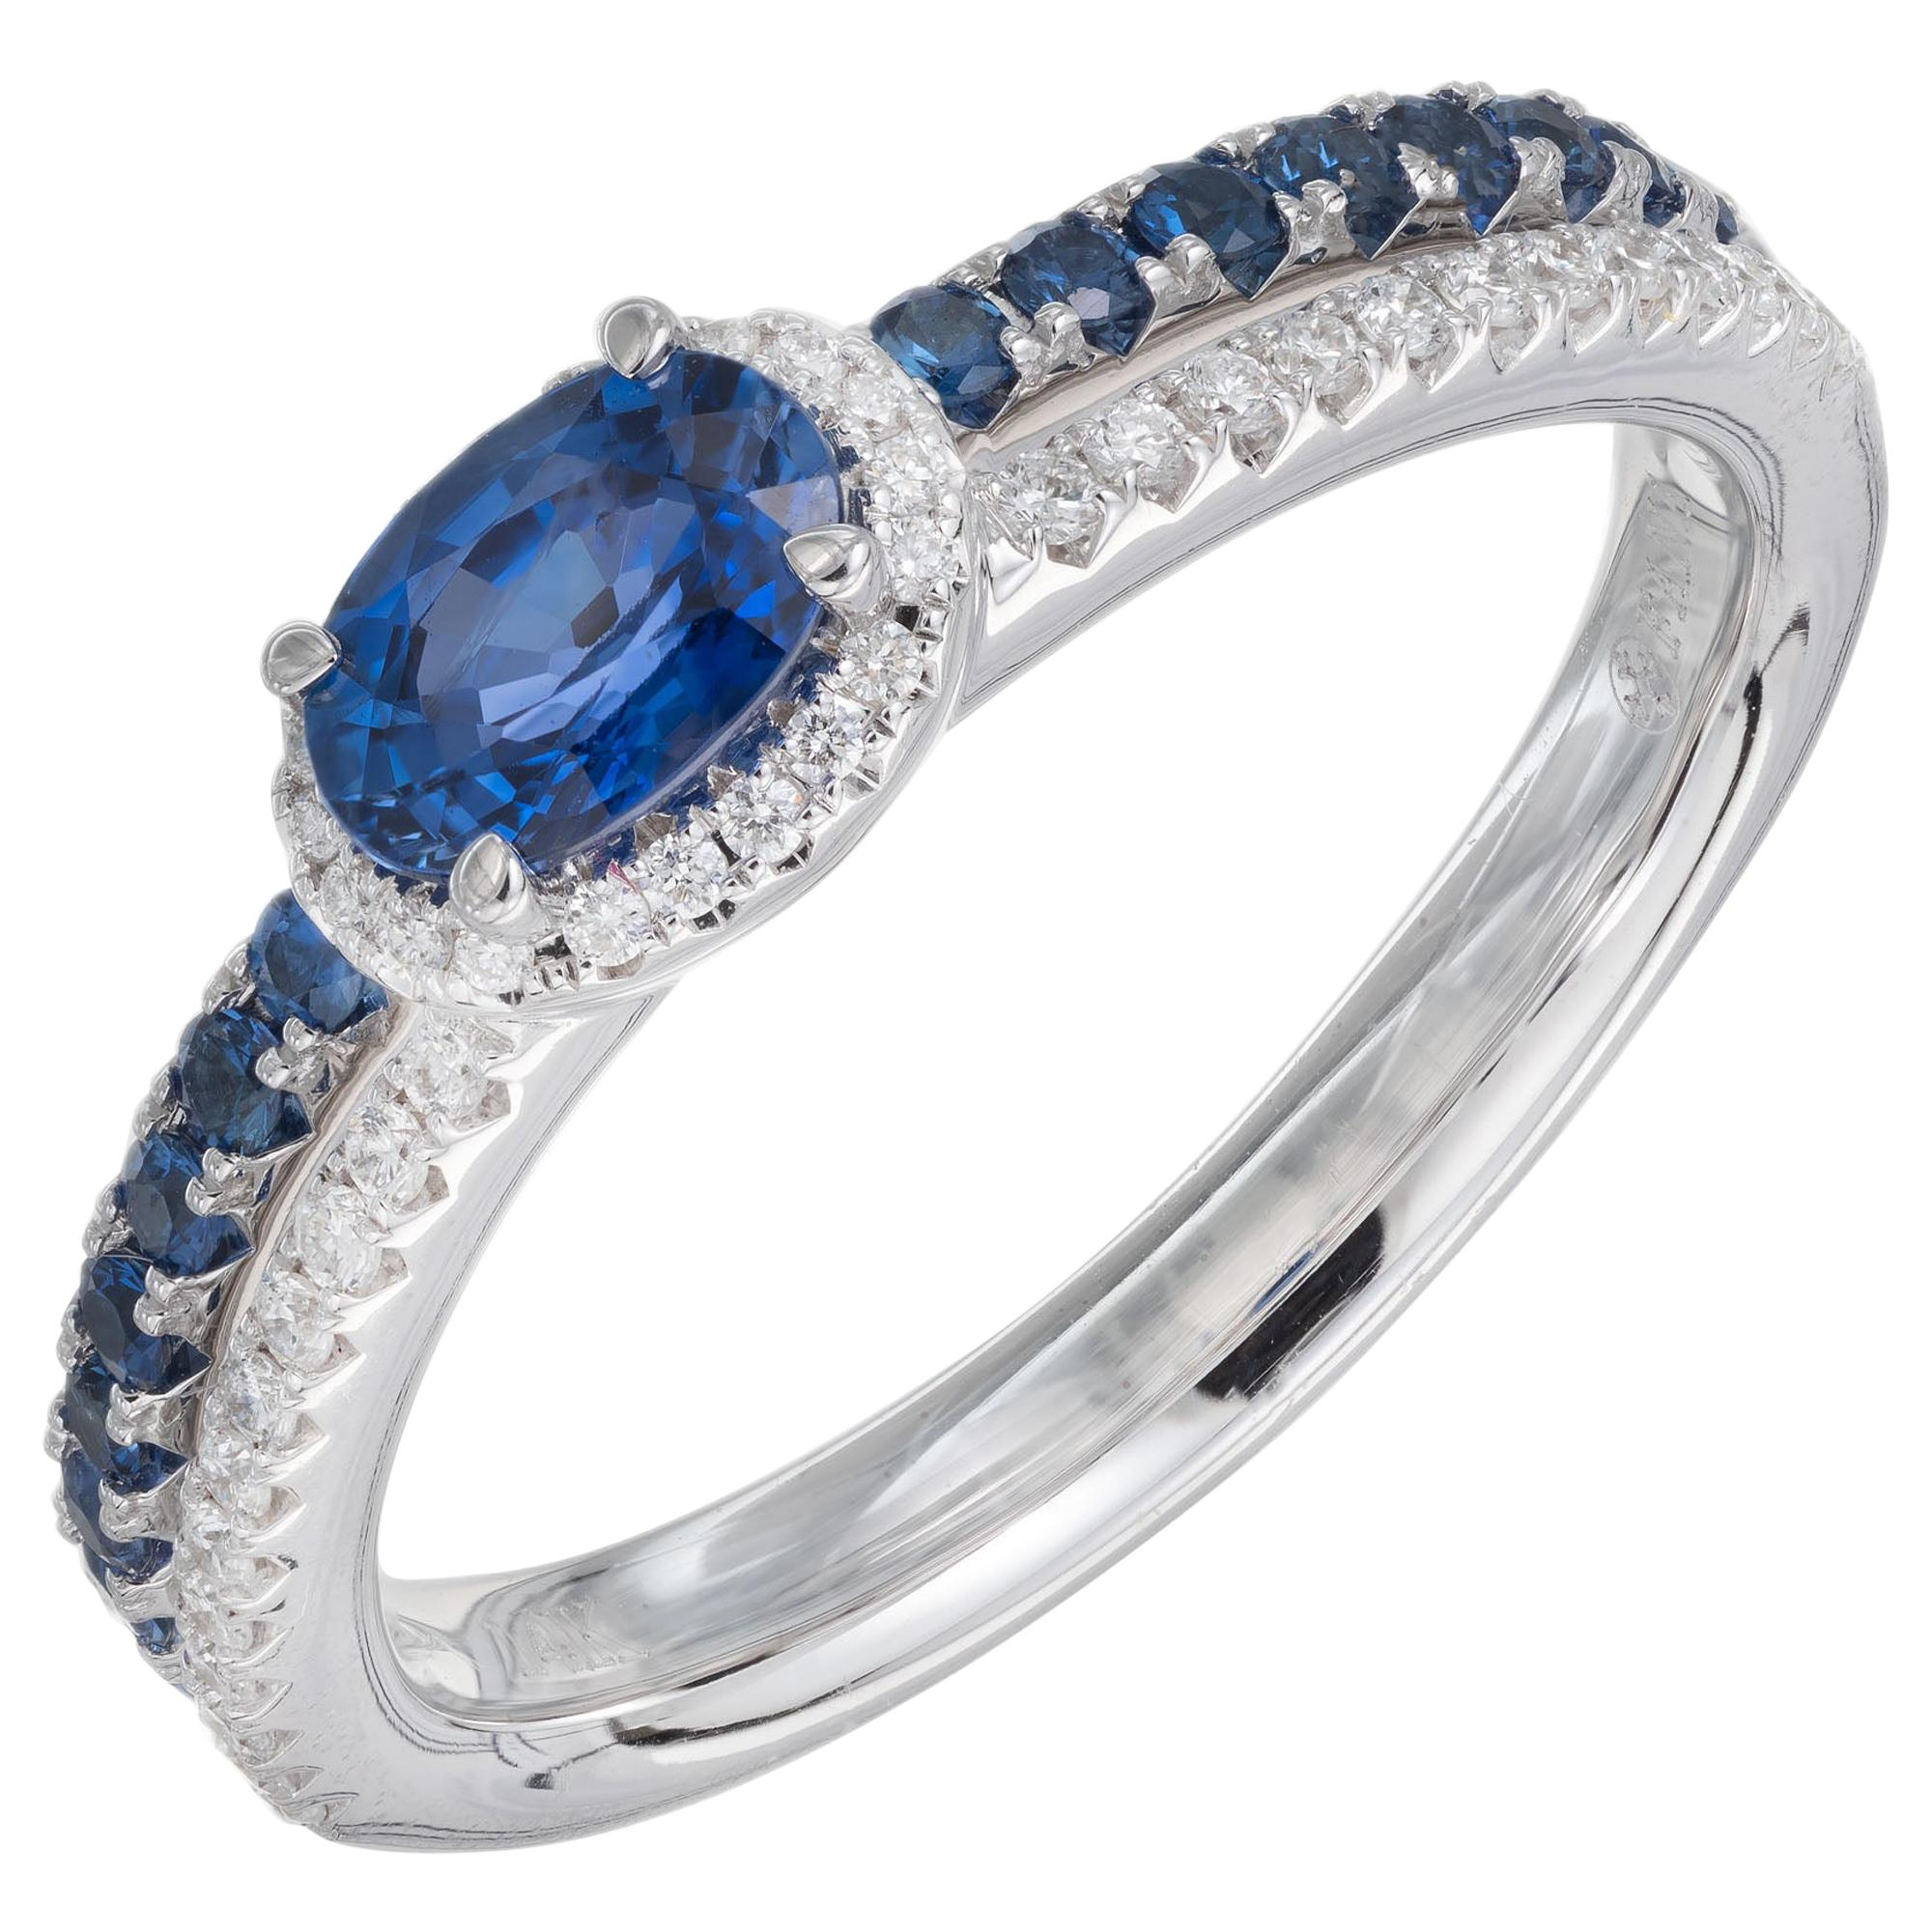 .53 Carat Oval Sapphire Diamond Engagement Ring